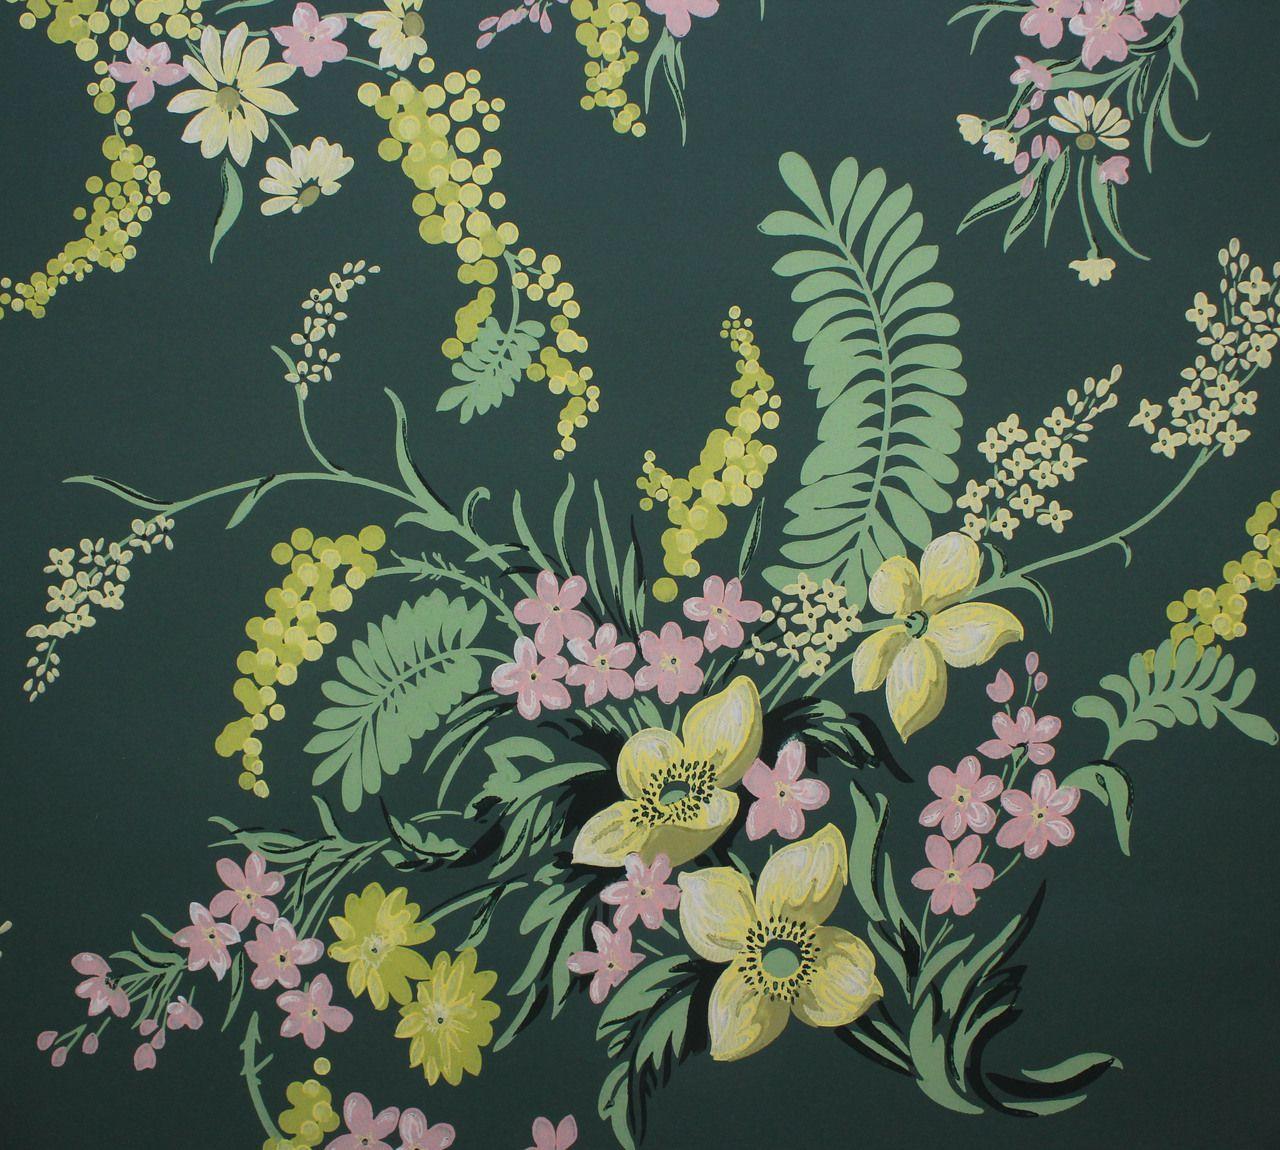 1940s Vintage Wallpaper Pretty Bouquets On Dark Green Vintage Wallpaper Prettiest Bouquet Mid Century Wallpaper